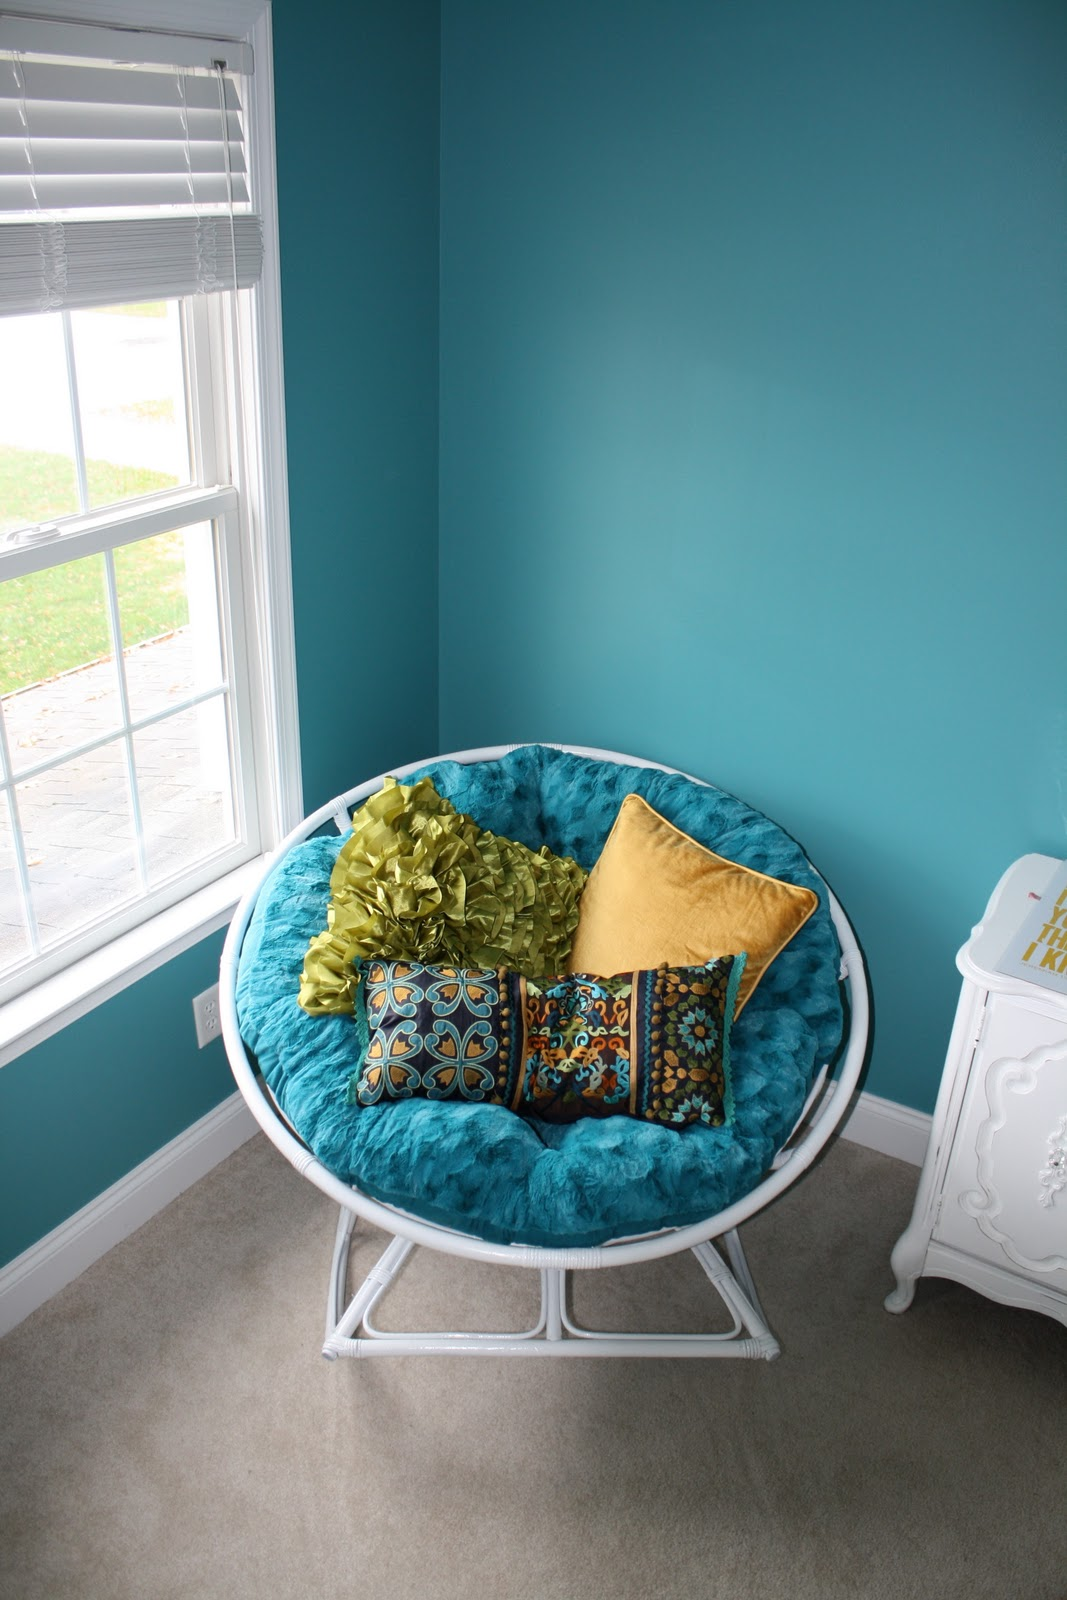 Papasan Chair In Living Room Papasan Rockasan Transformation Part 2 In The Nursery